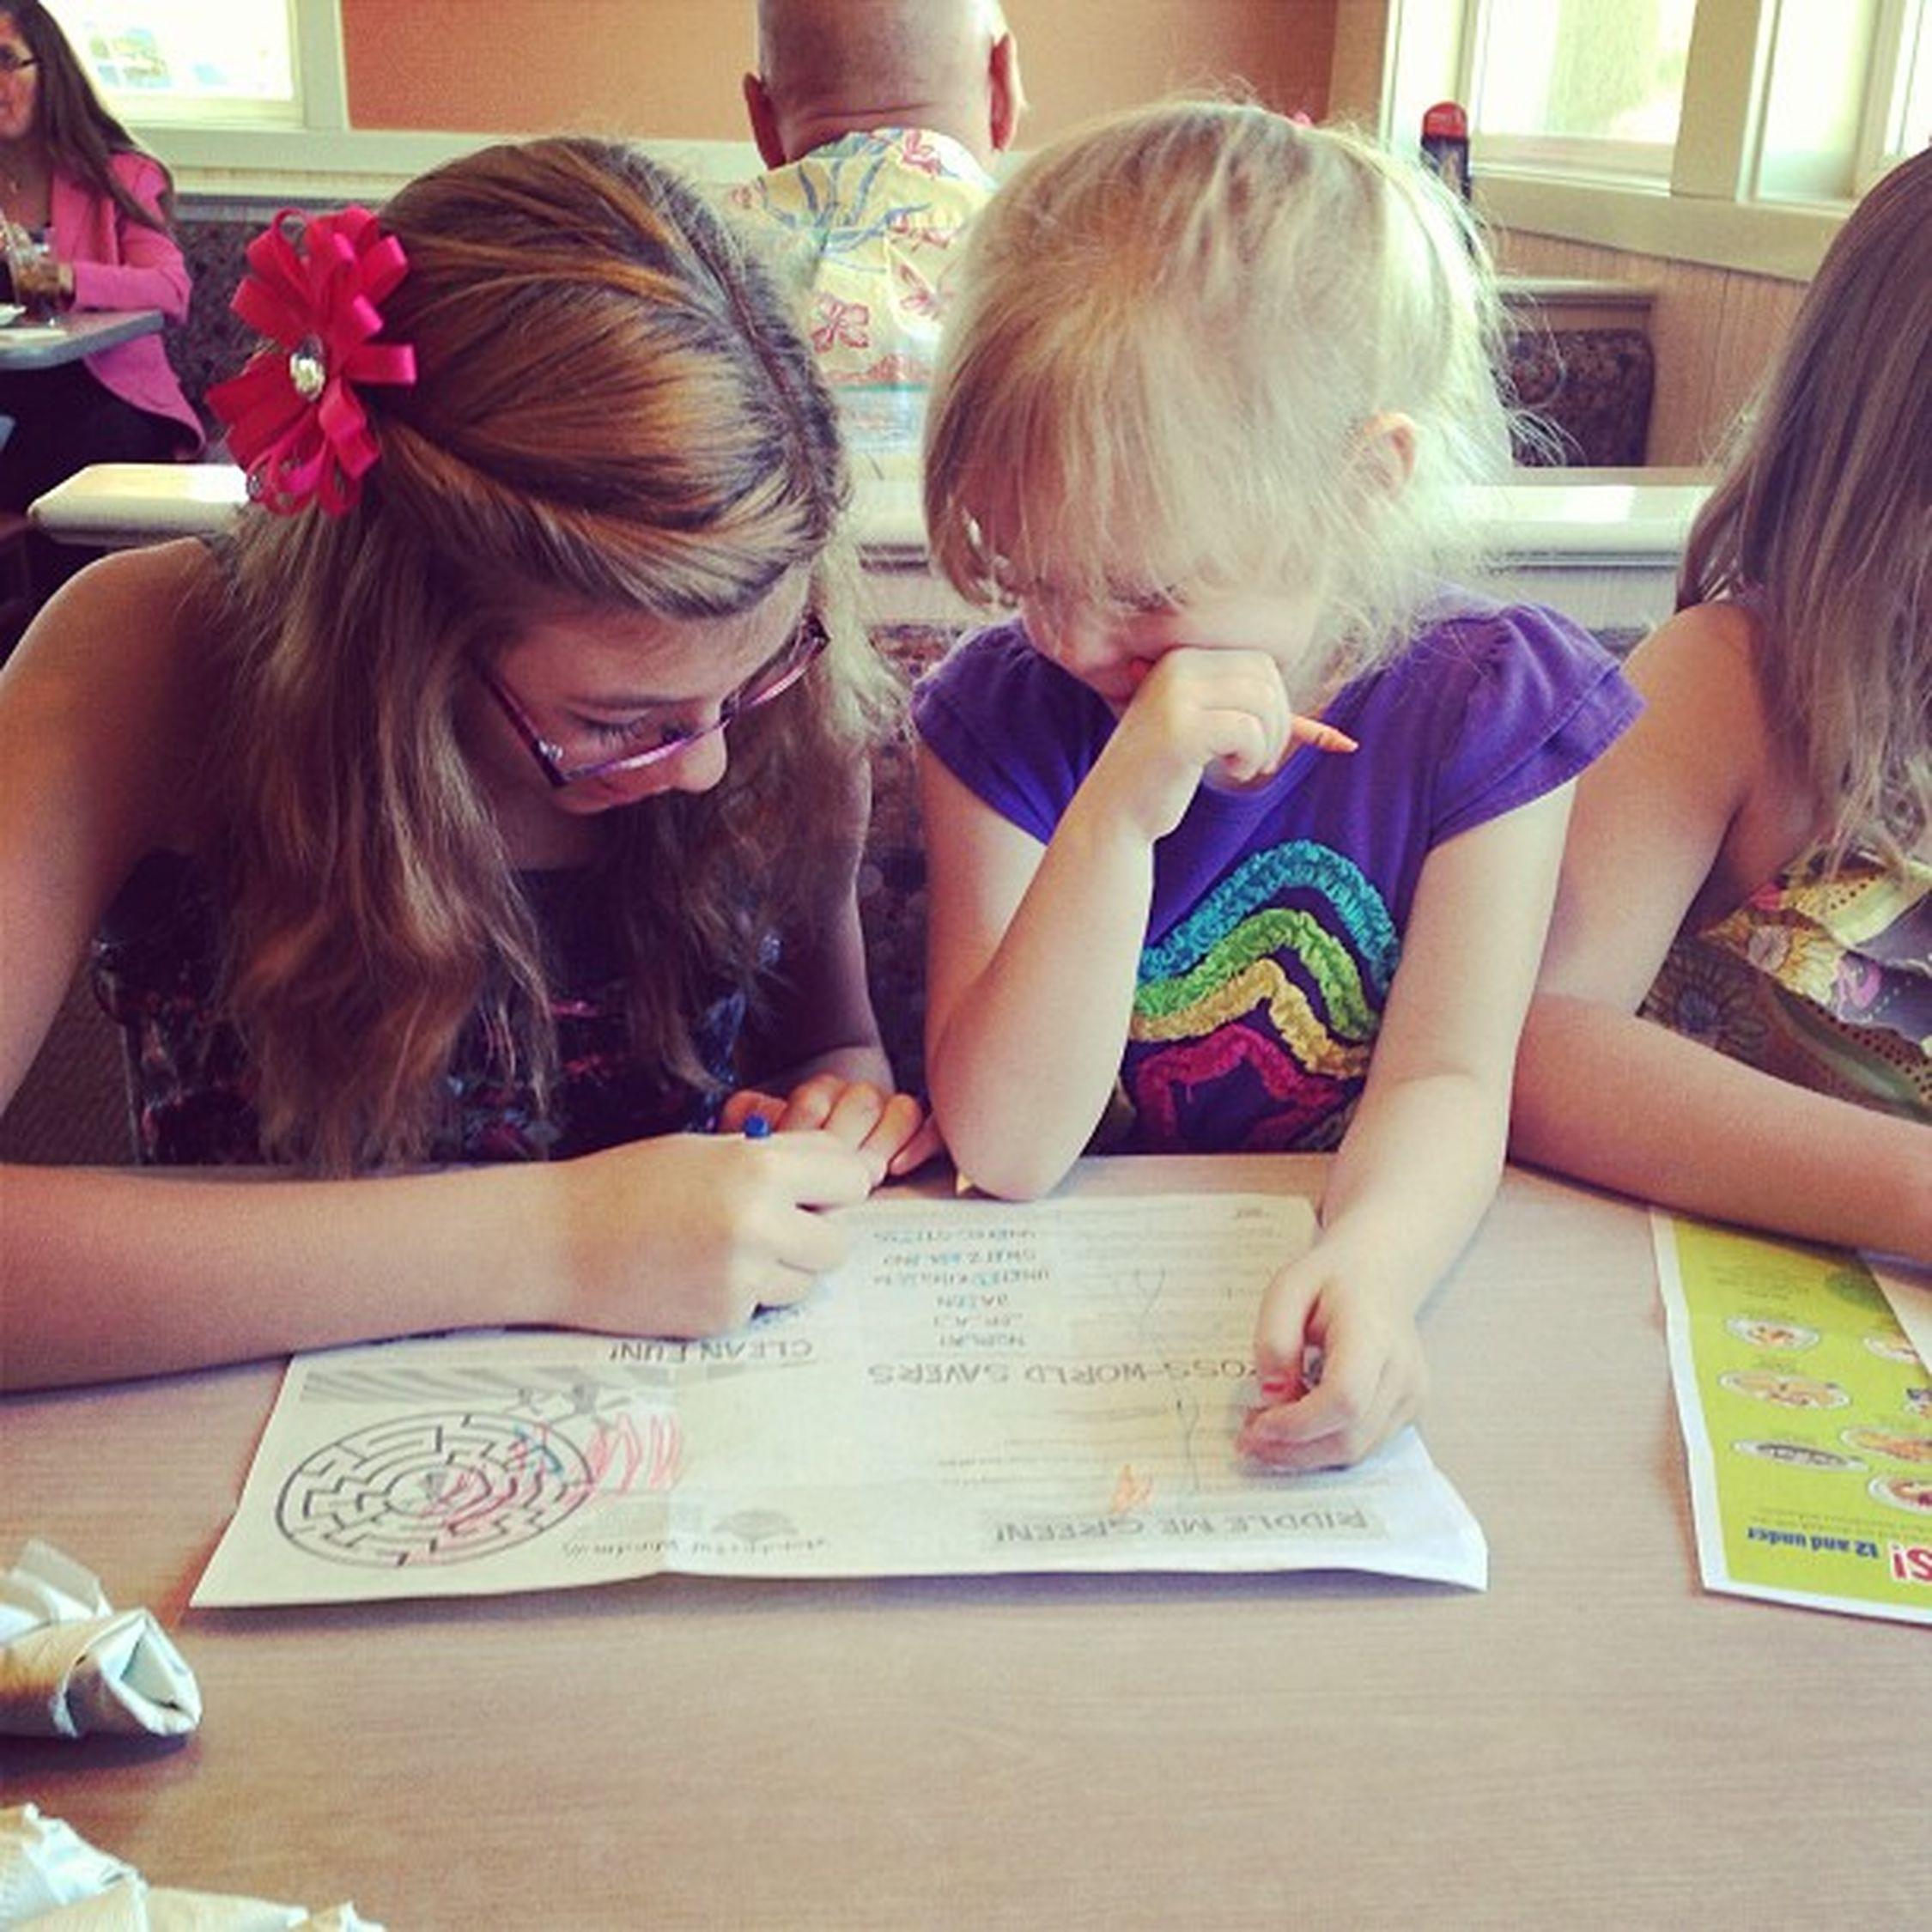 Briona & Katie coloring at IHOP Littlecousin Littlecousins Ihop Coloring crayons tictactoe kingman kingmanaz